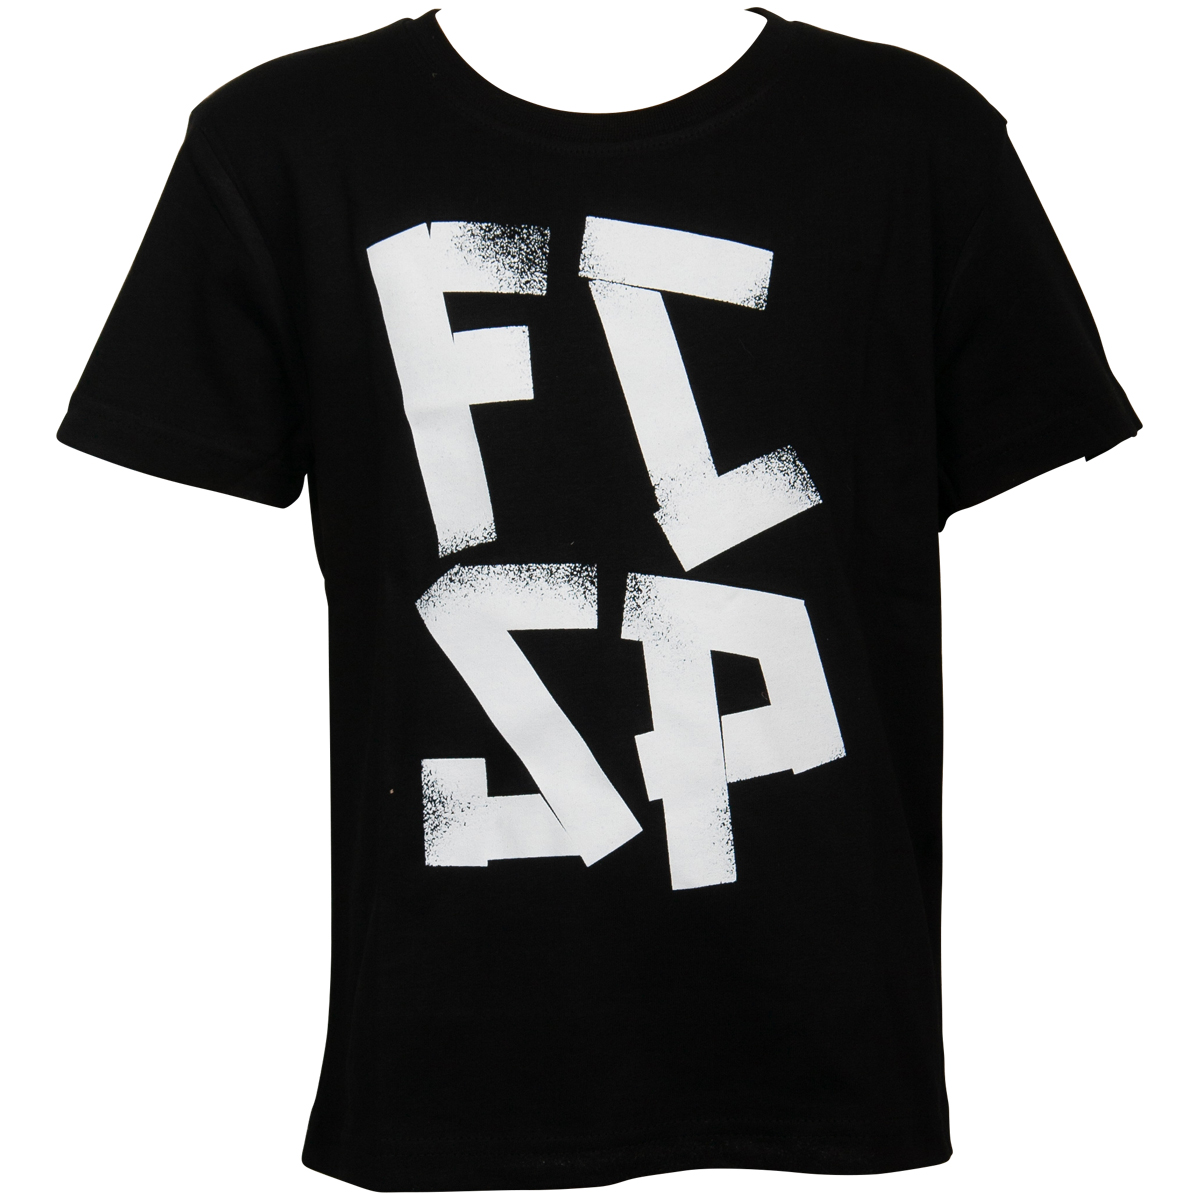 FC St. Pauli - Kinder T-Shirt FCSP - schwarz